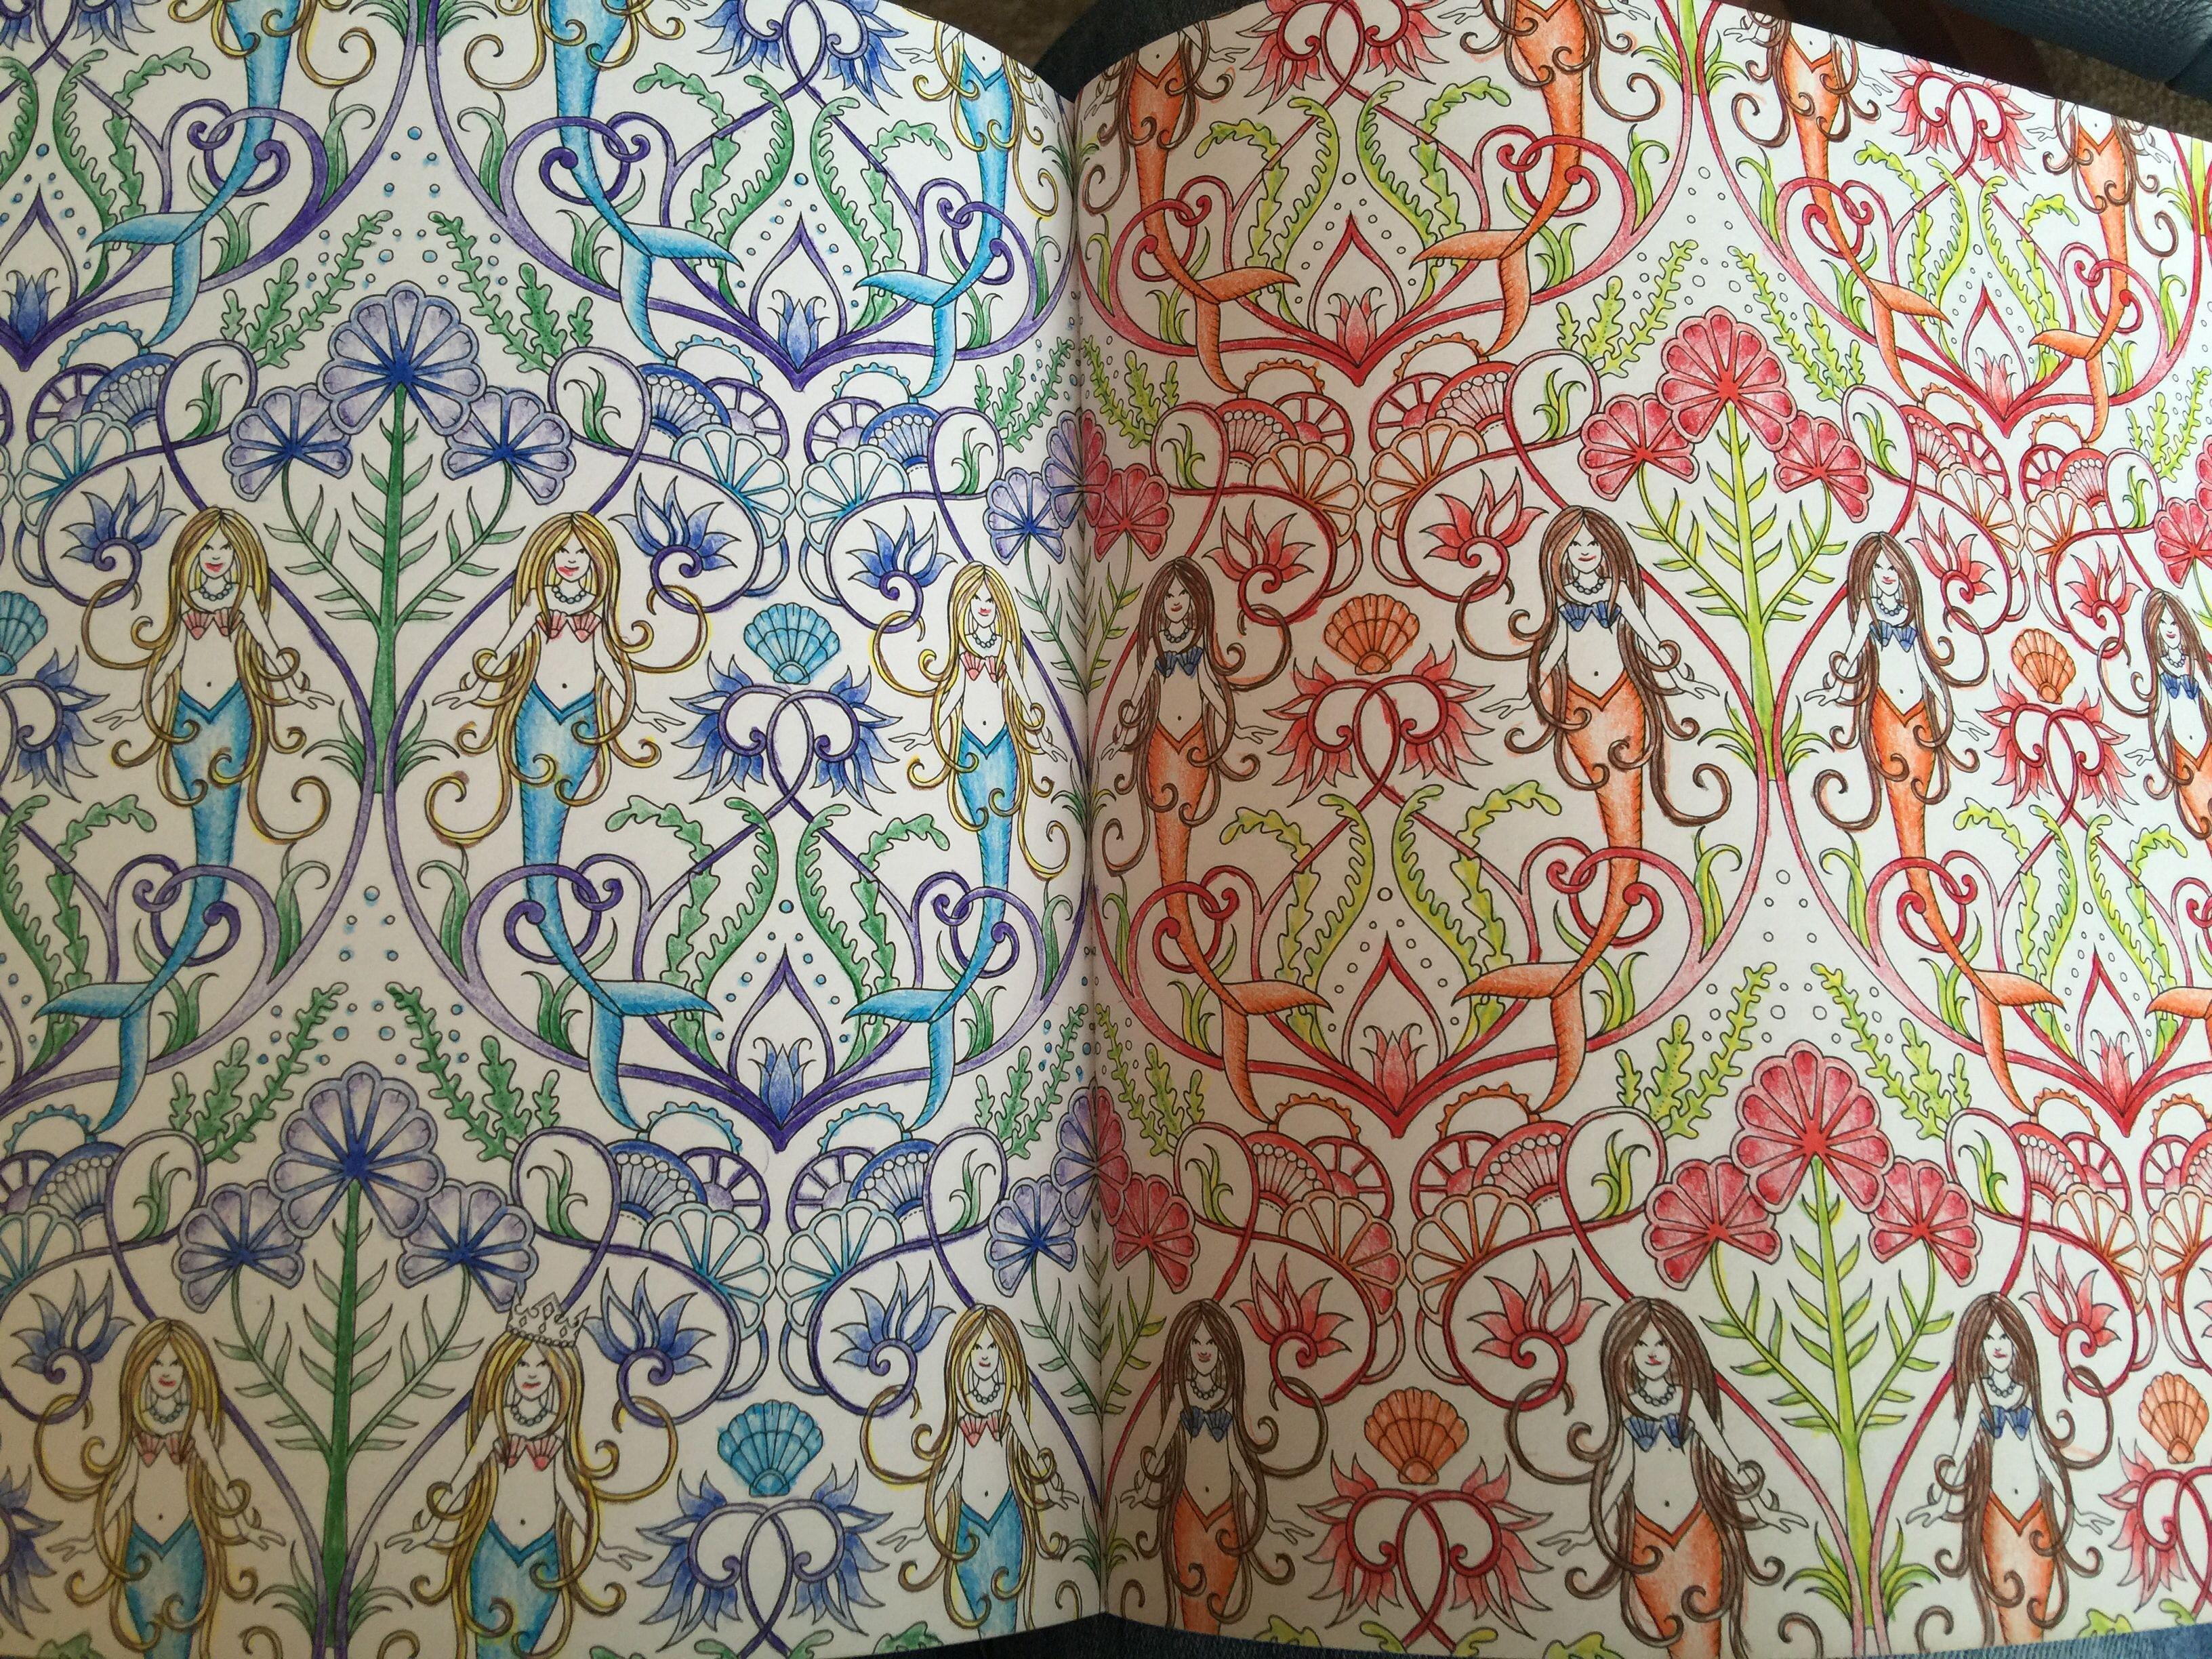 Zen ocean colouring book - Lost Ocean Coloring Book